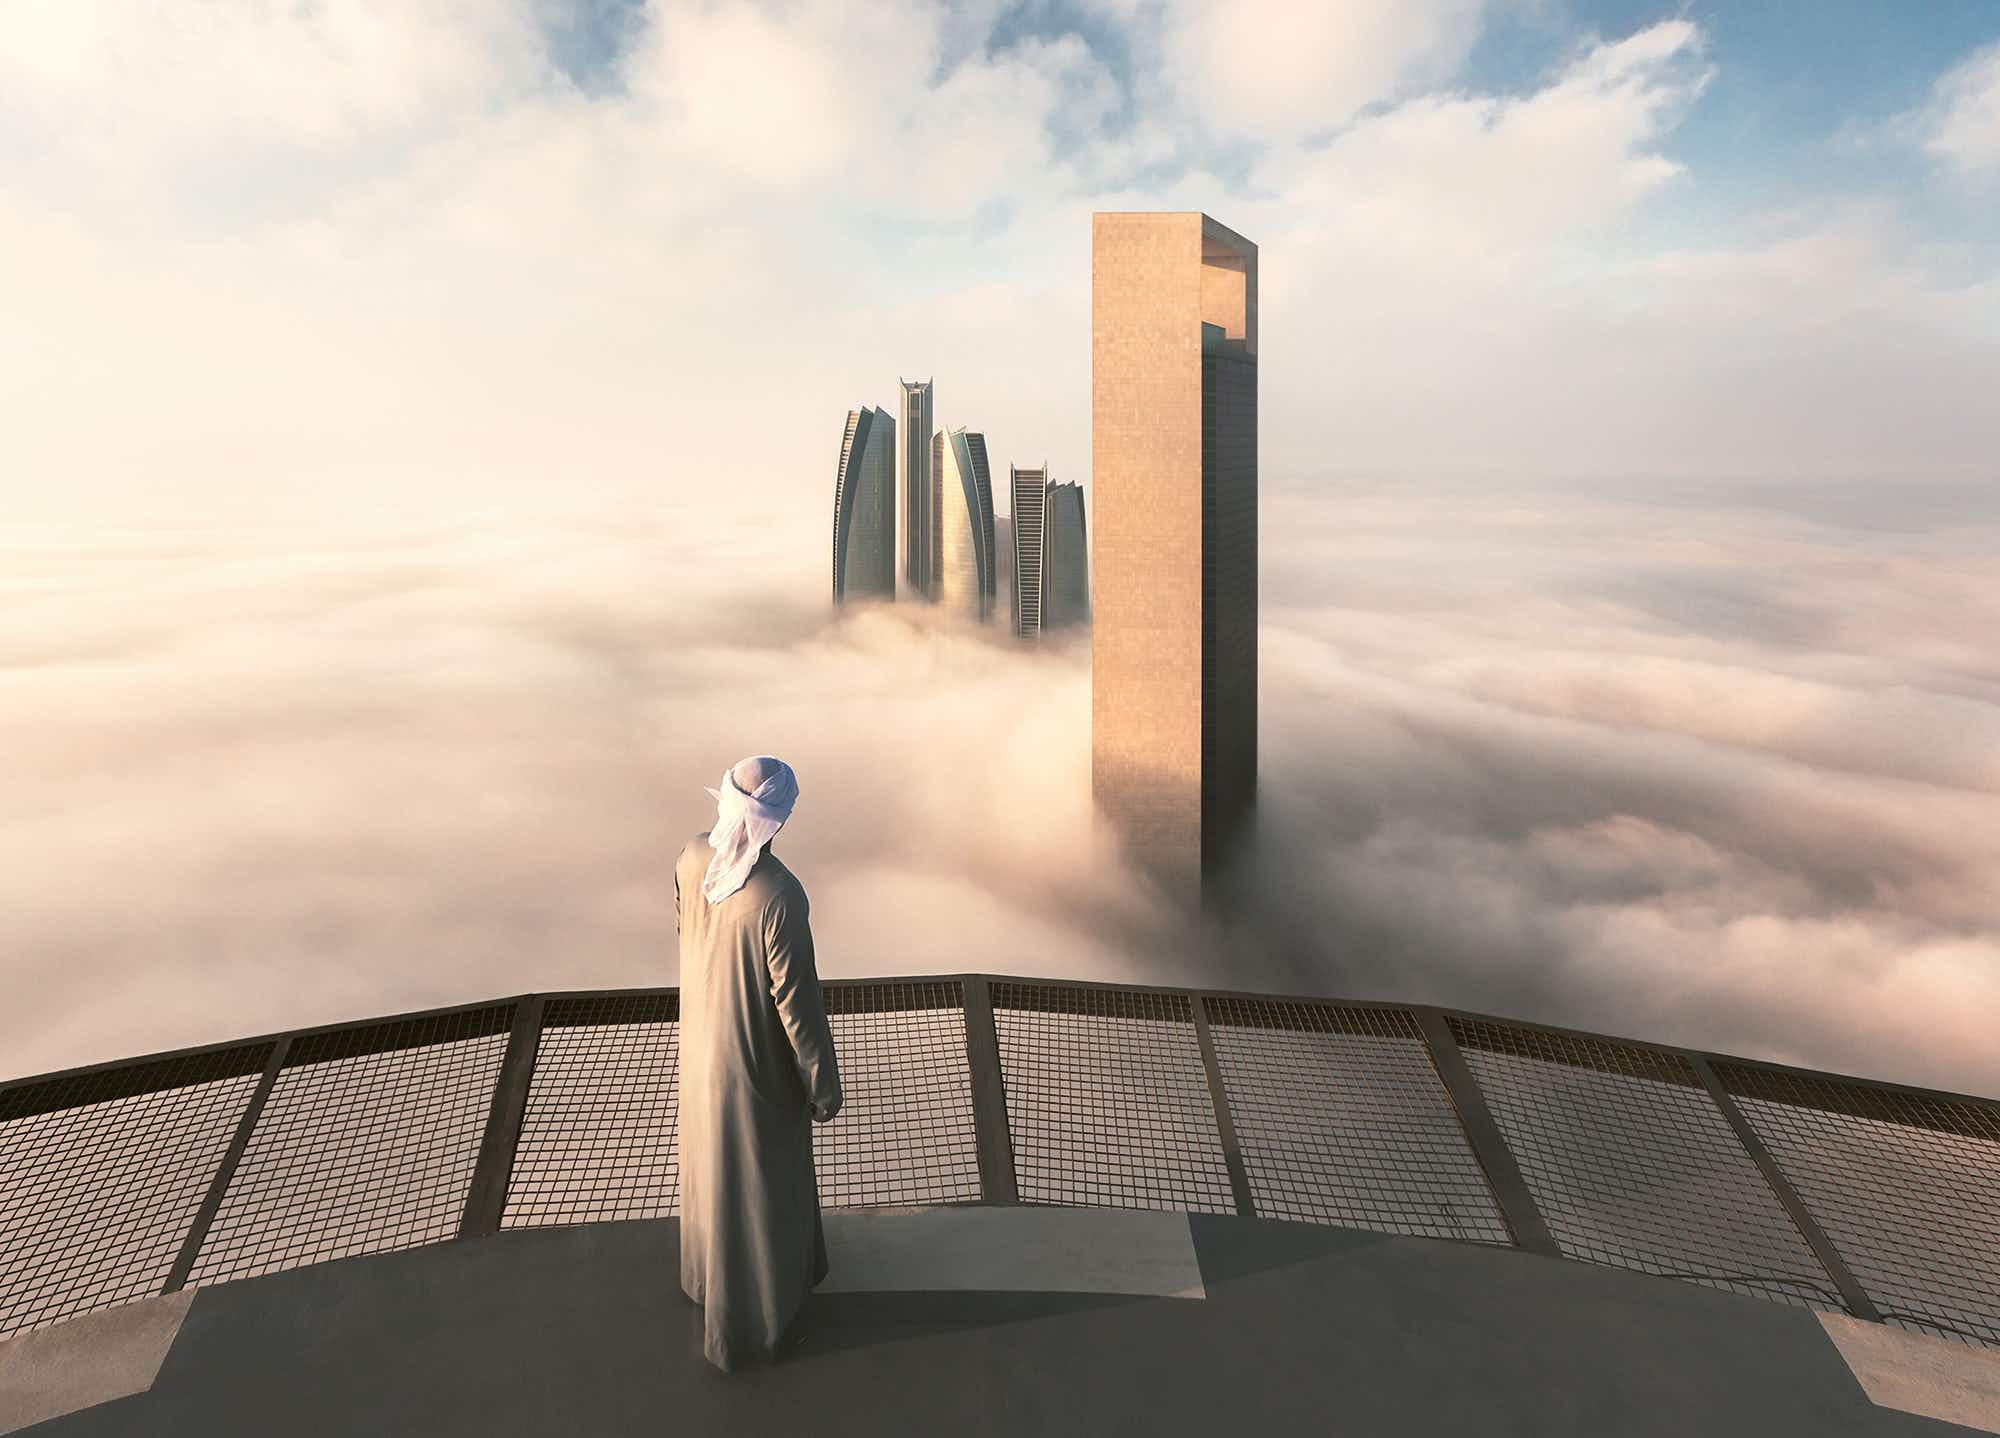 See Abu Dhabi looking absolutely dreamy during 'fog season'